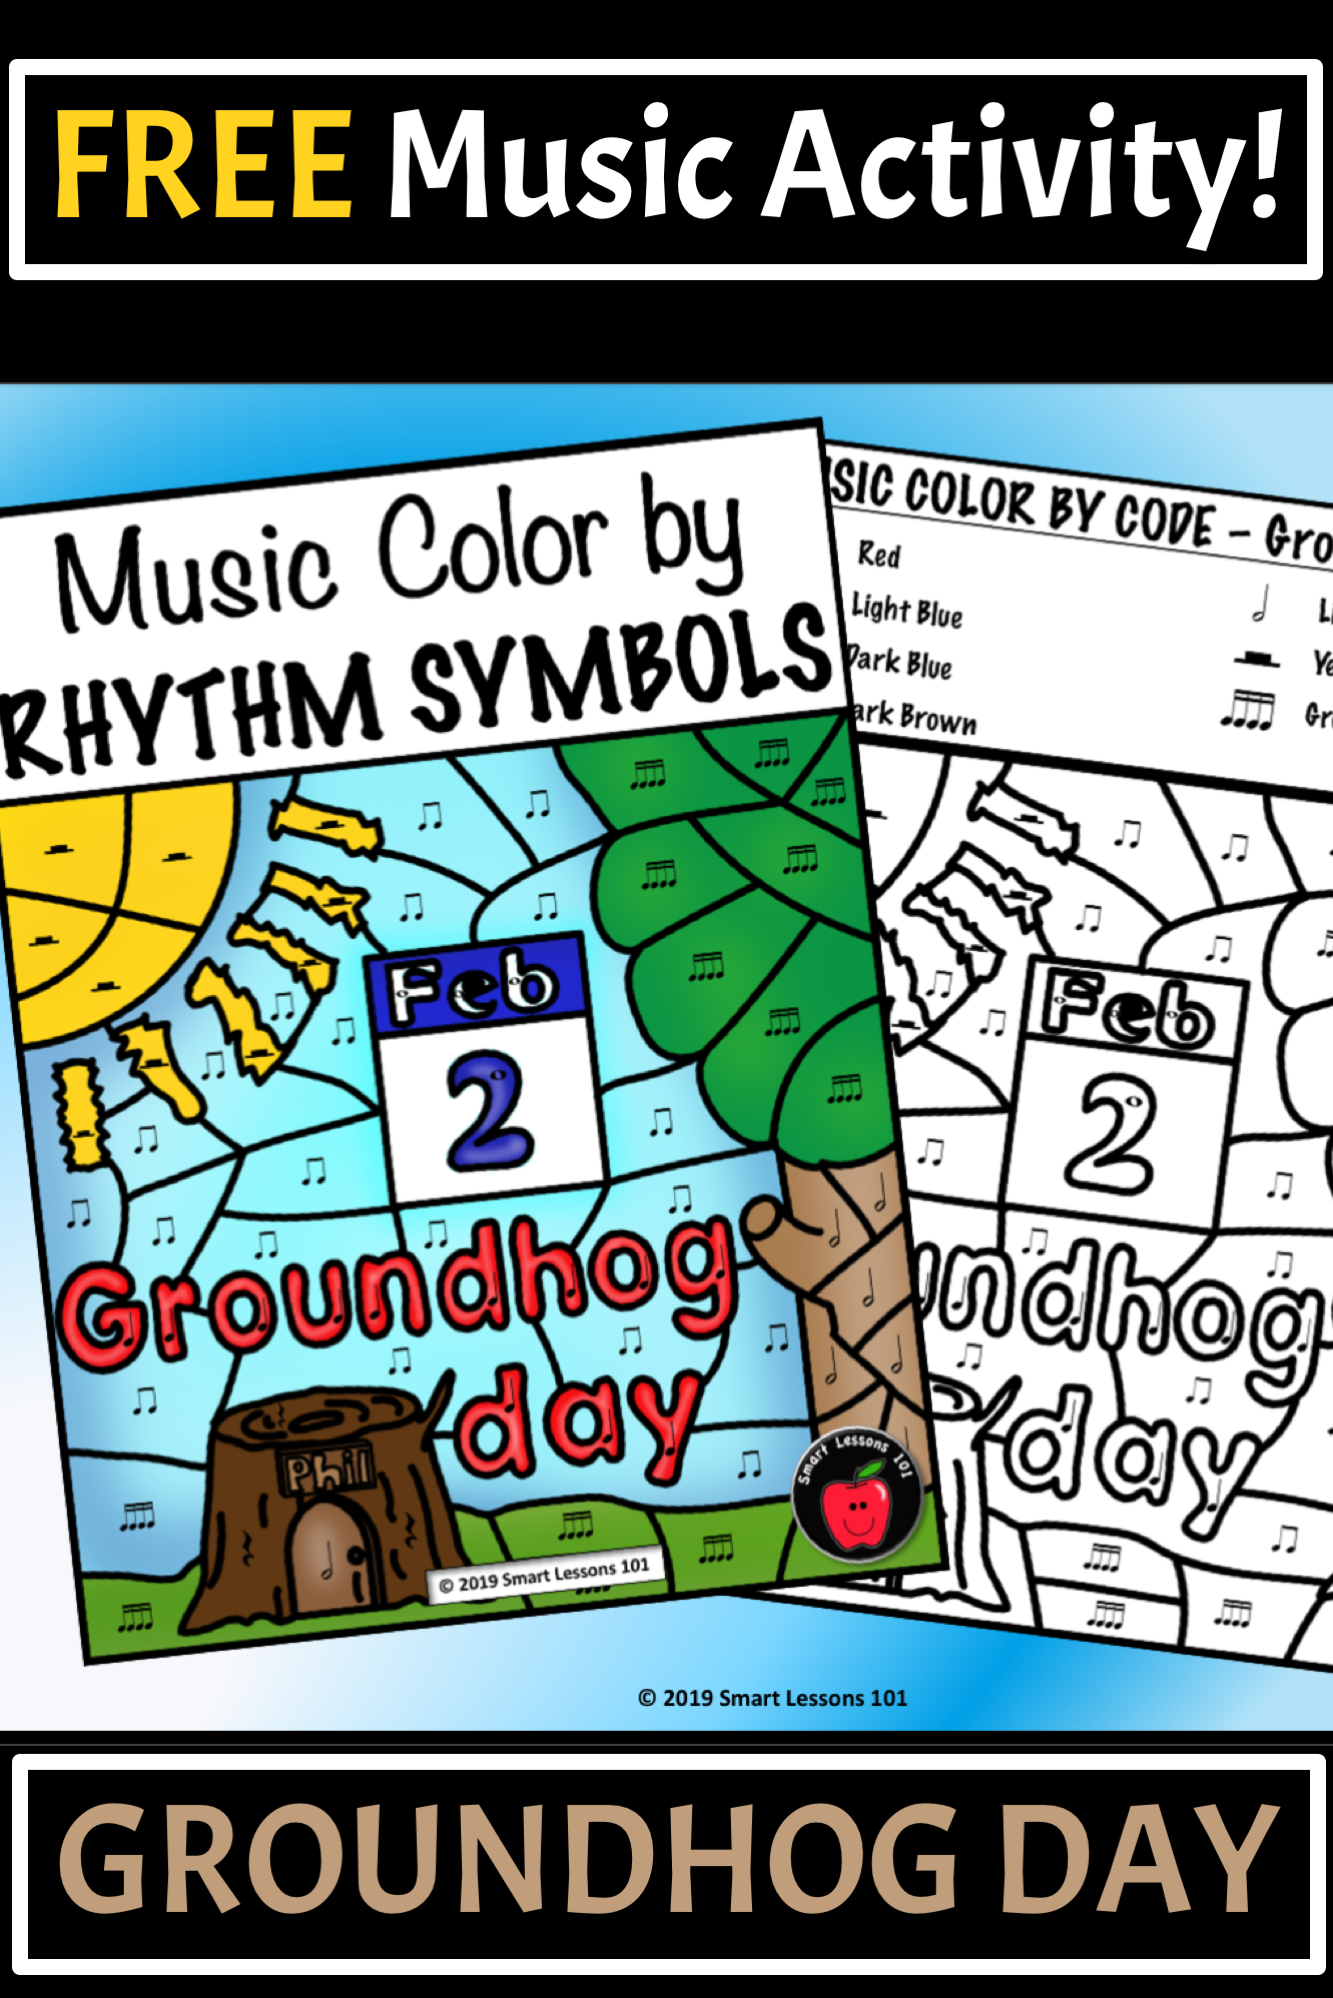 Free Groundhog Day Music Color By Rhythm Groundhog Day